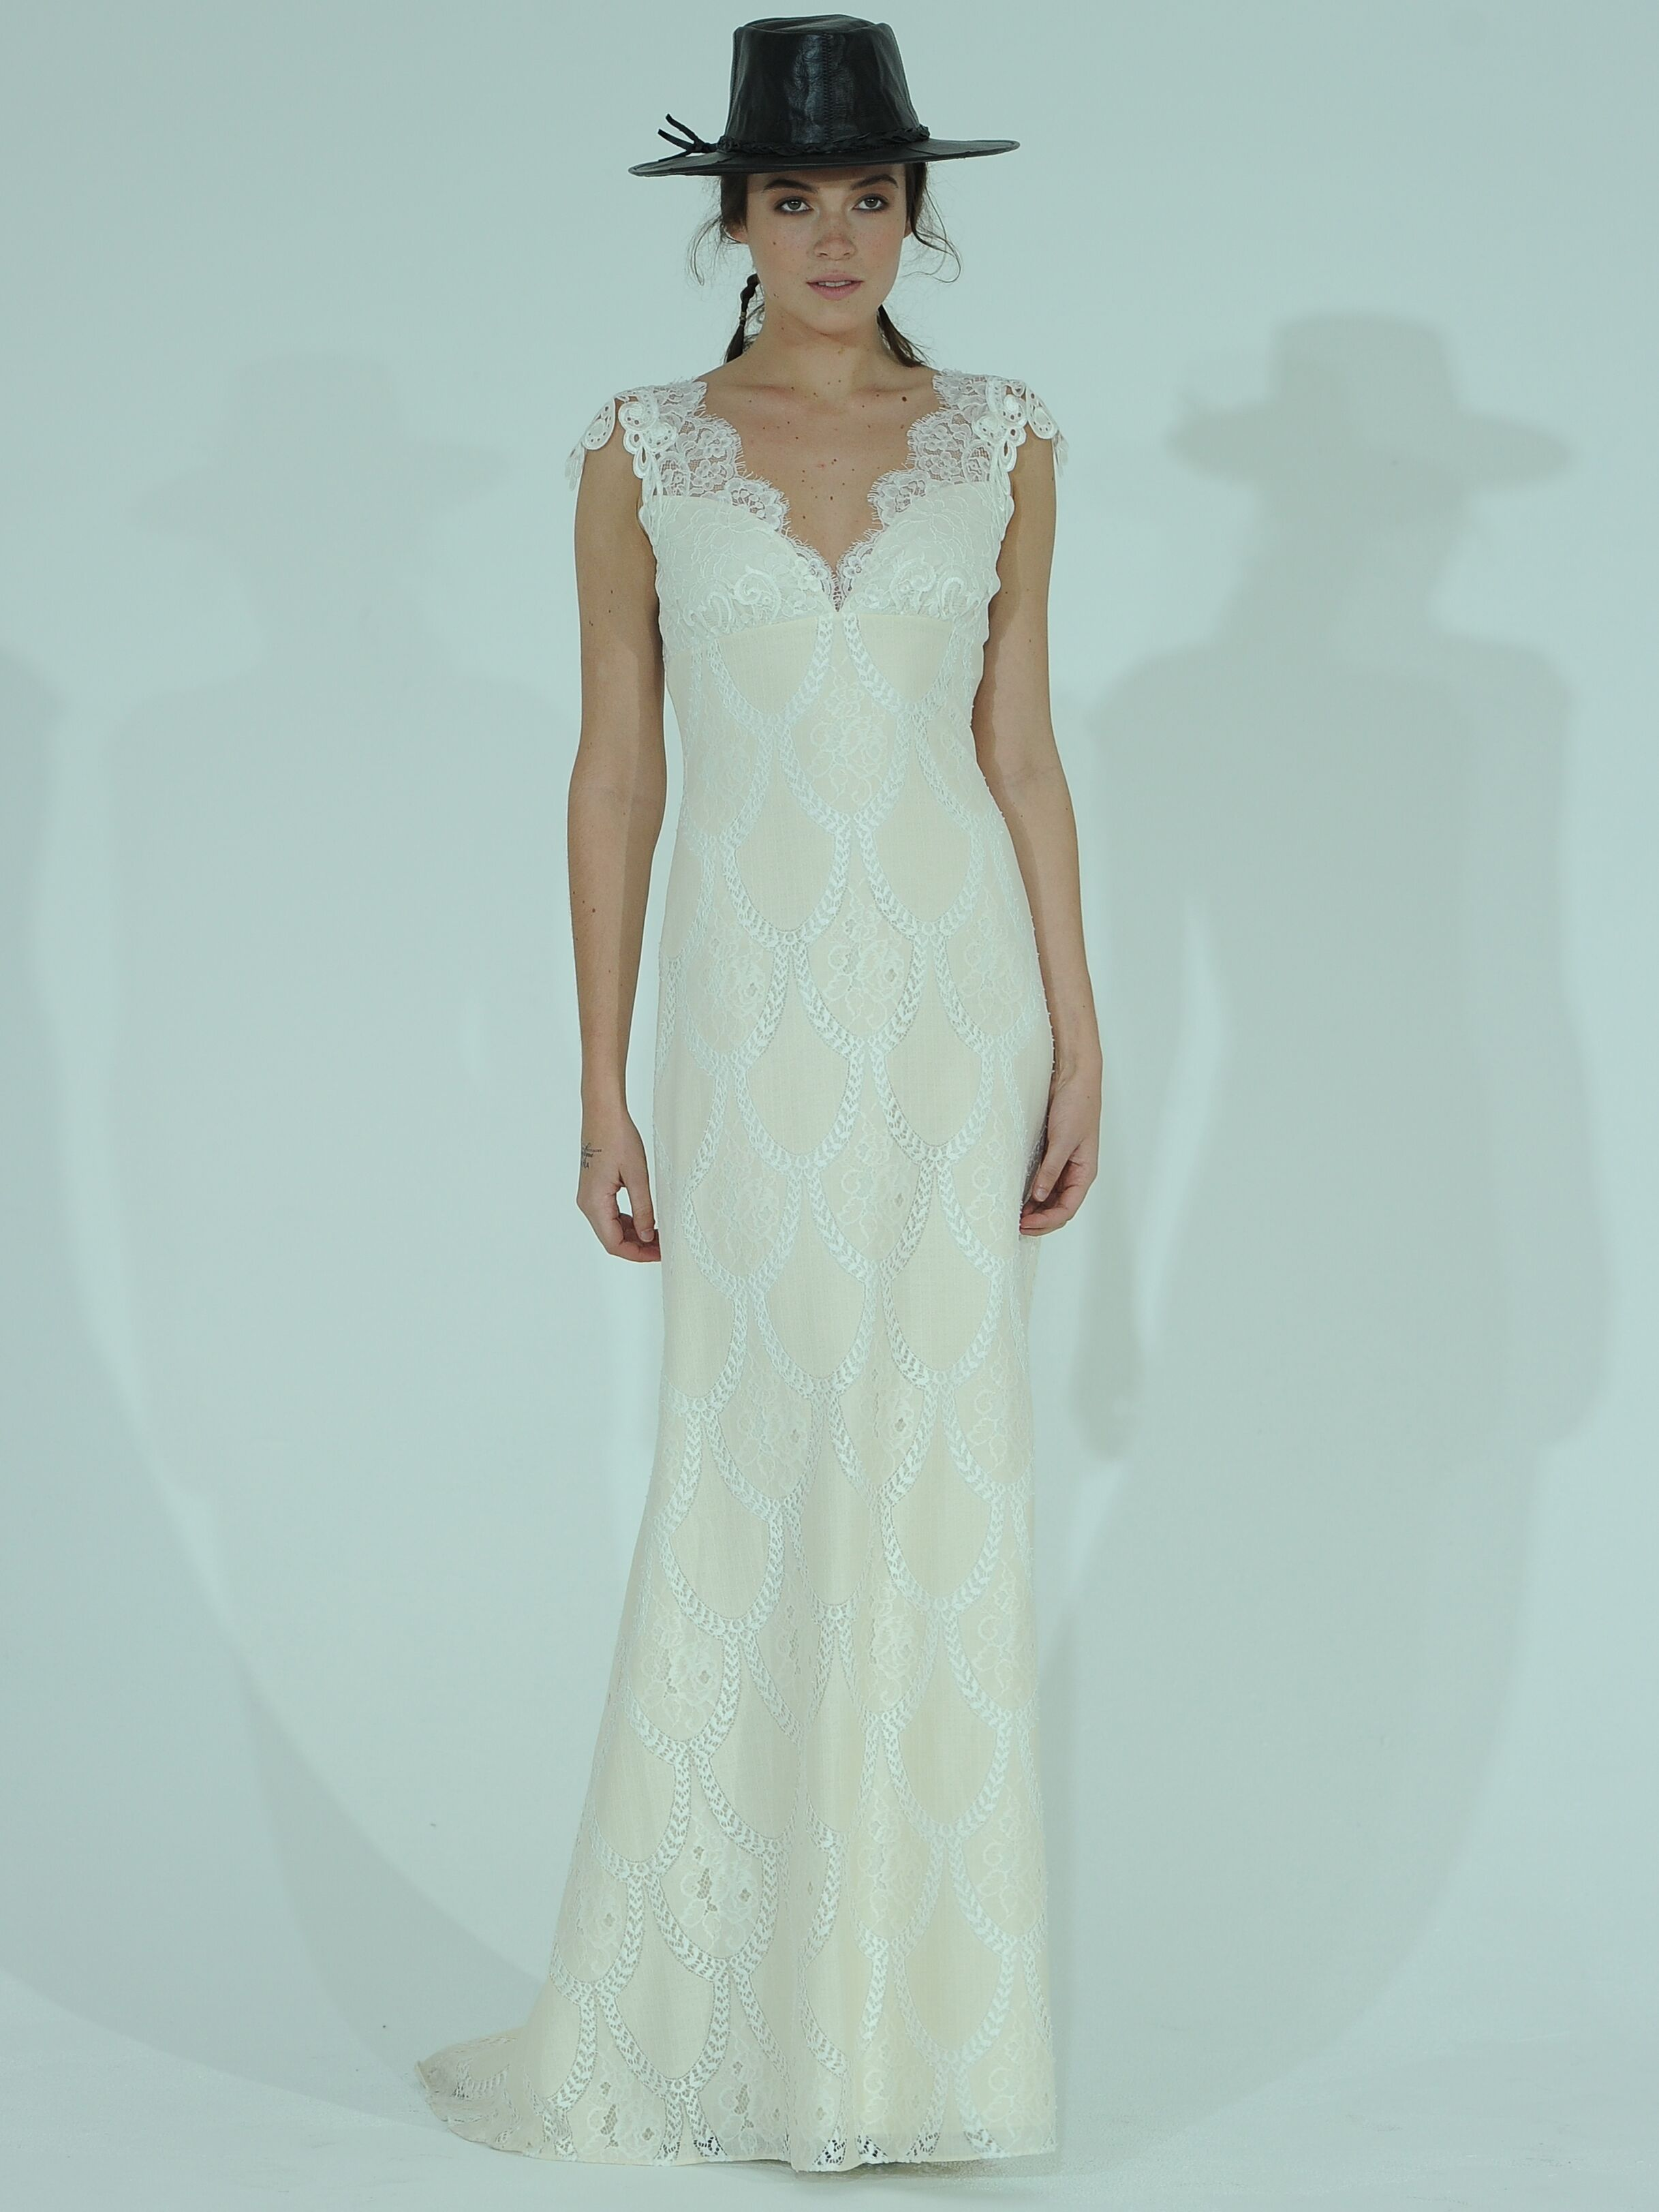 Famous Wedding Dresses Billings Mt Images - Wedding Ideas ...